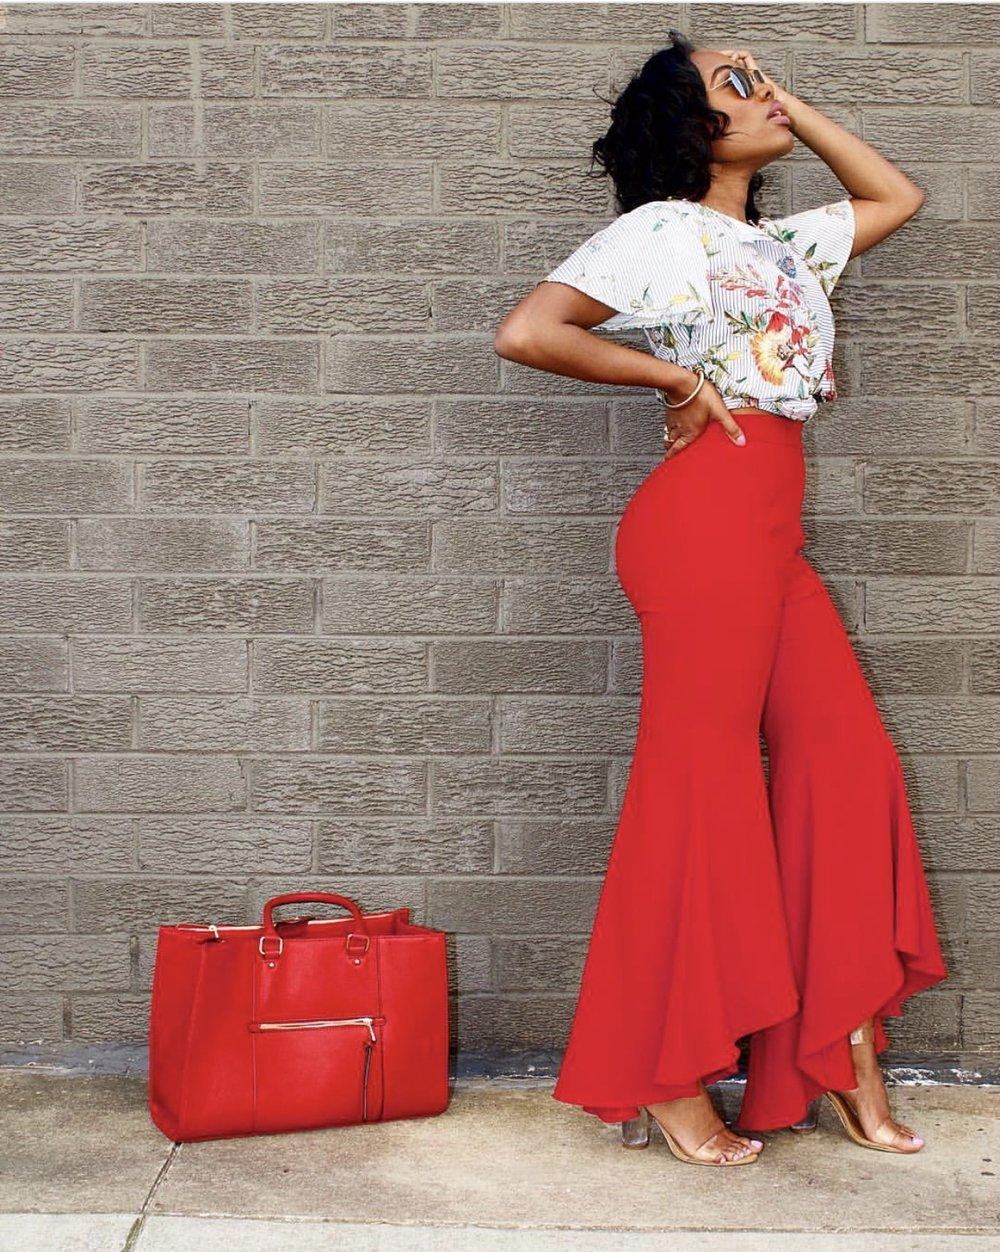 Styled by Ebonne Holyfield